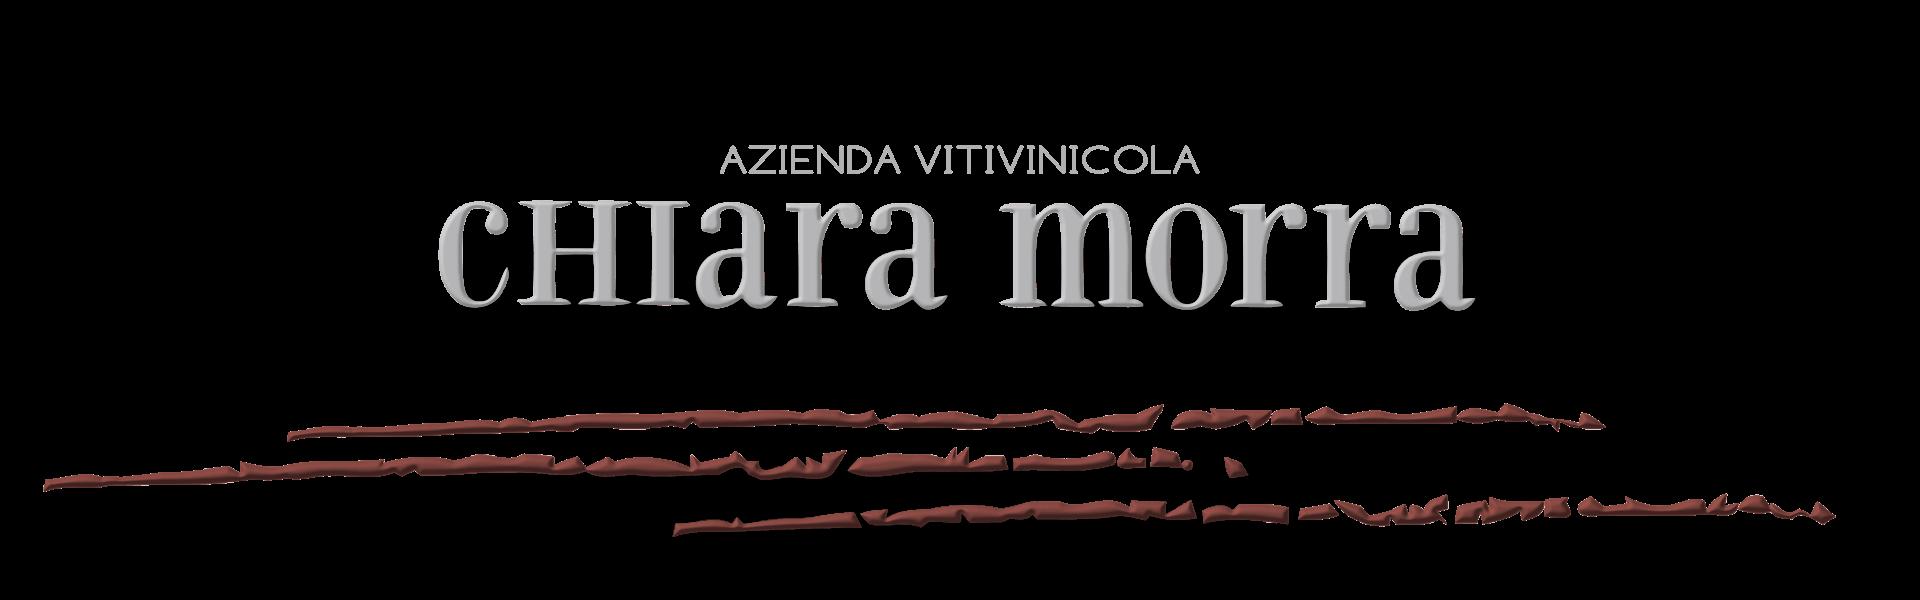 Azienda Agricola Chiara Morra